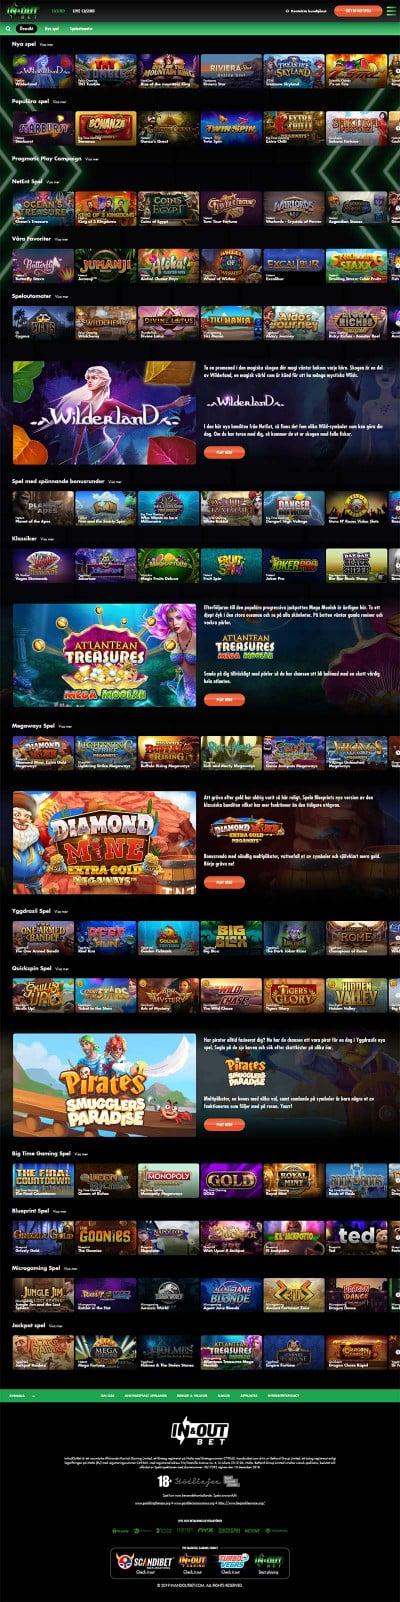 Inandoutbet Casino Screenshot